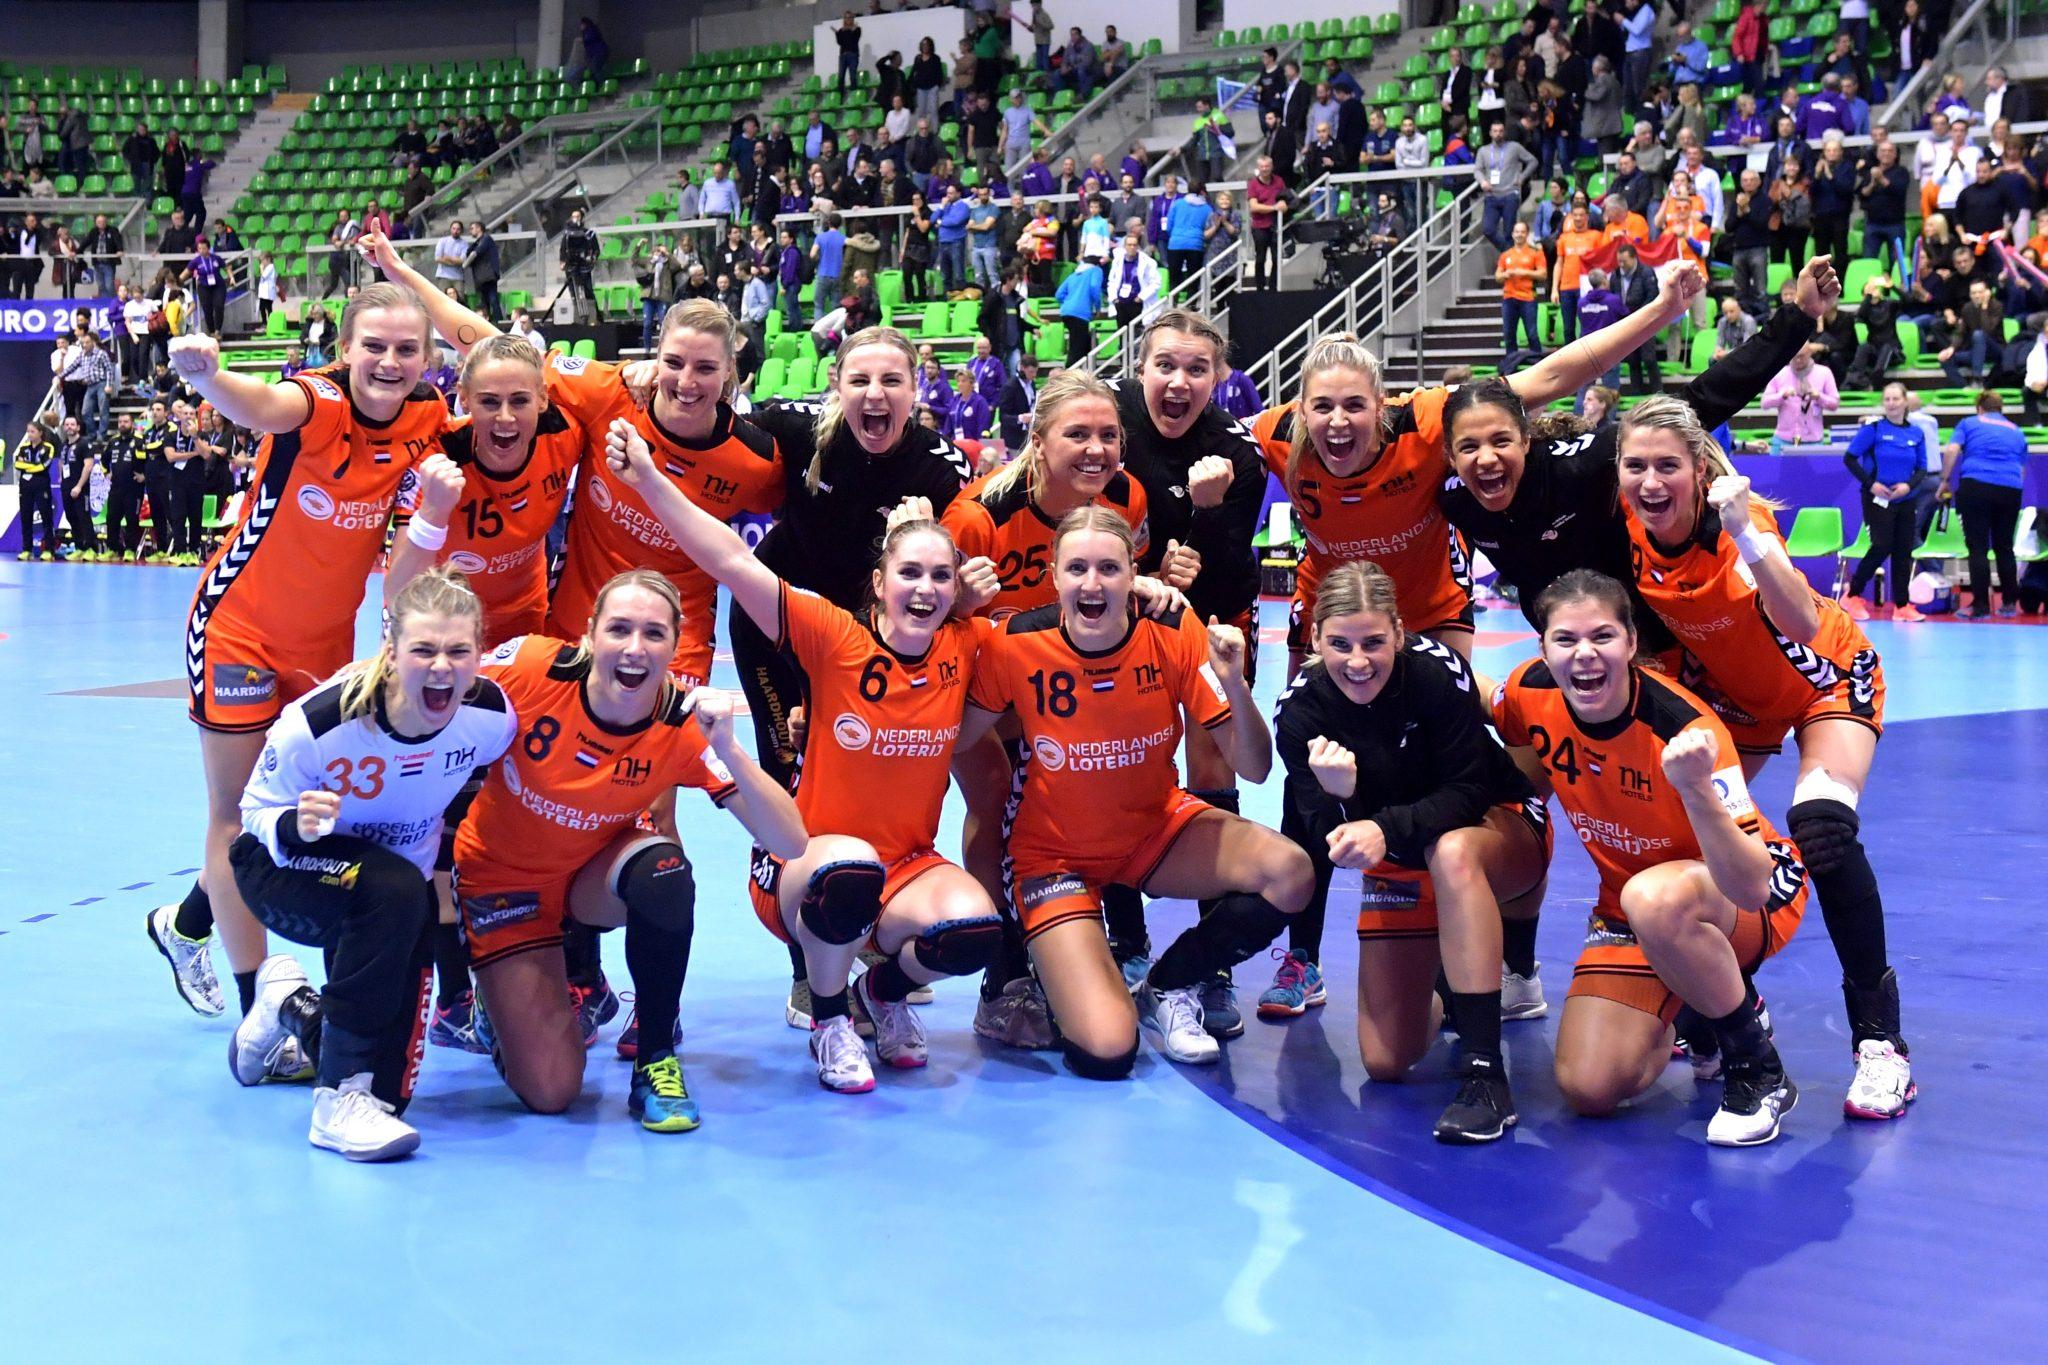 03-12-2018: EK Handbal Vrouwen: Nederland V Spanje: MontBeliard EK Handbal In Frankrijk, Voorronde Groep C Nederland - Spanje De Overwinning Is Binnen